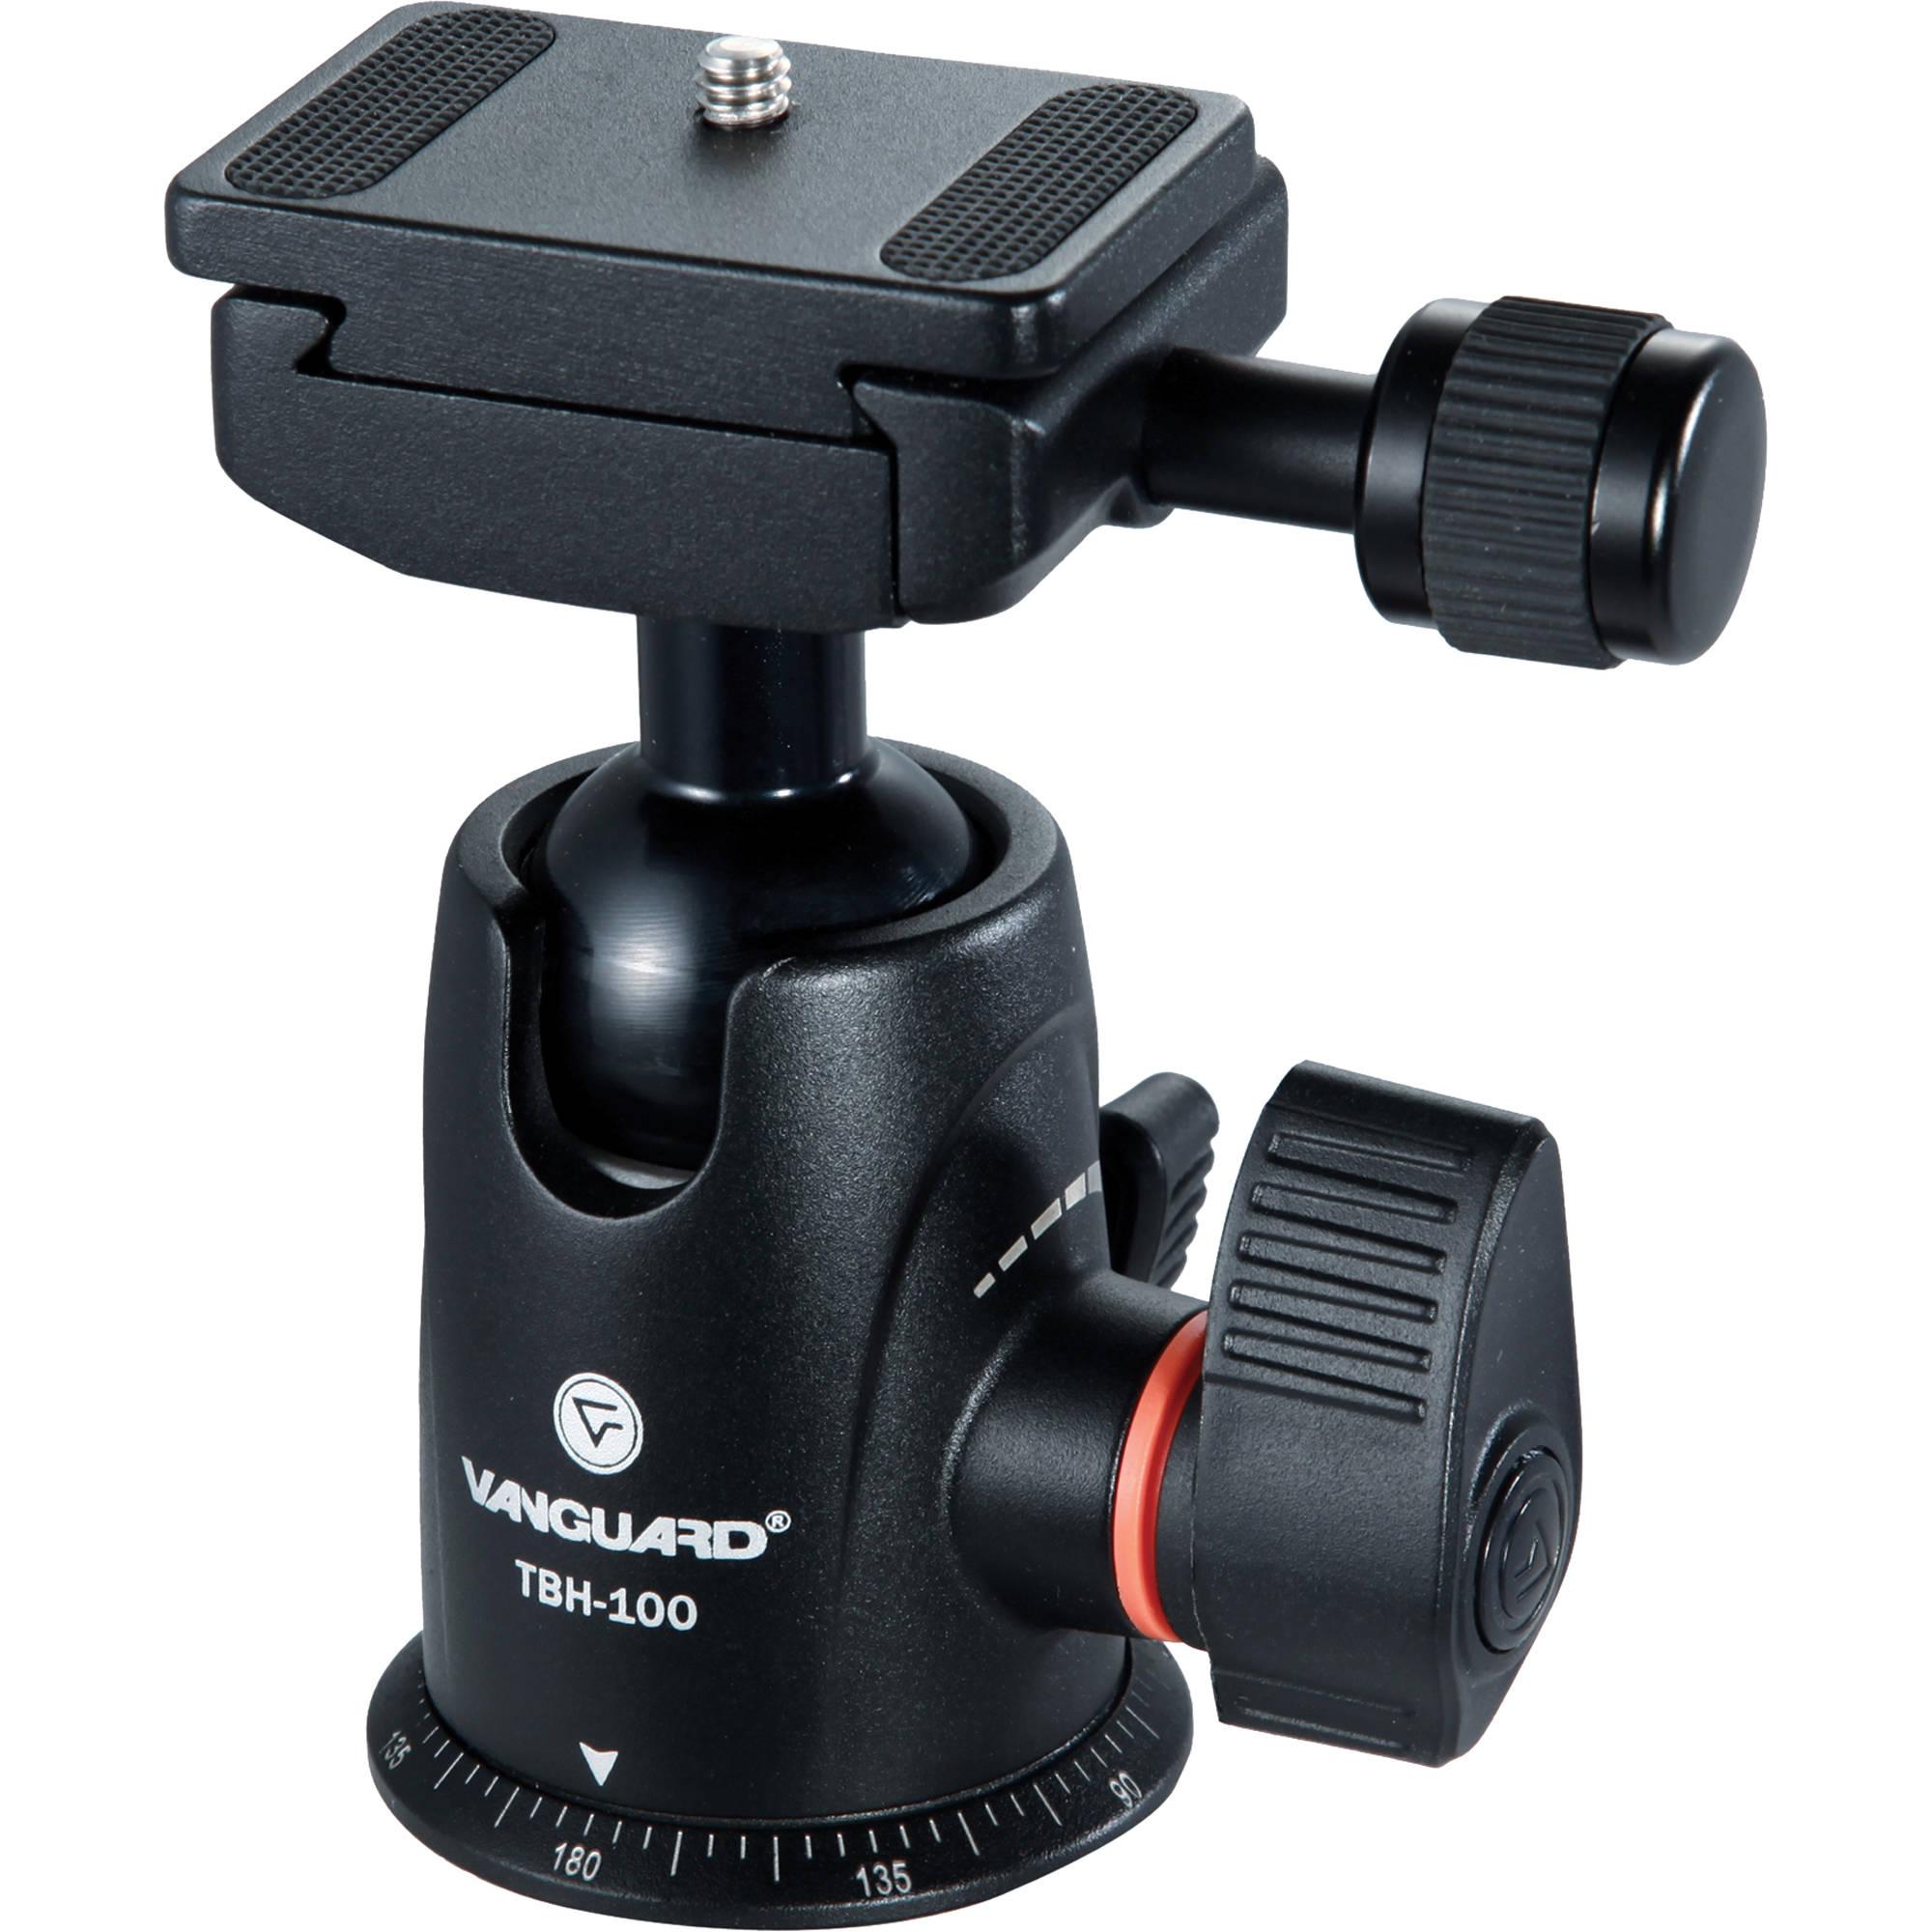 Rótula de bola para trípode Vanguard TBH-100 magnesio